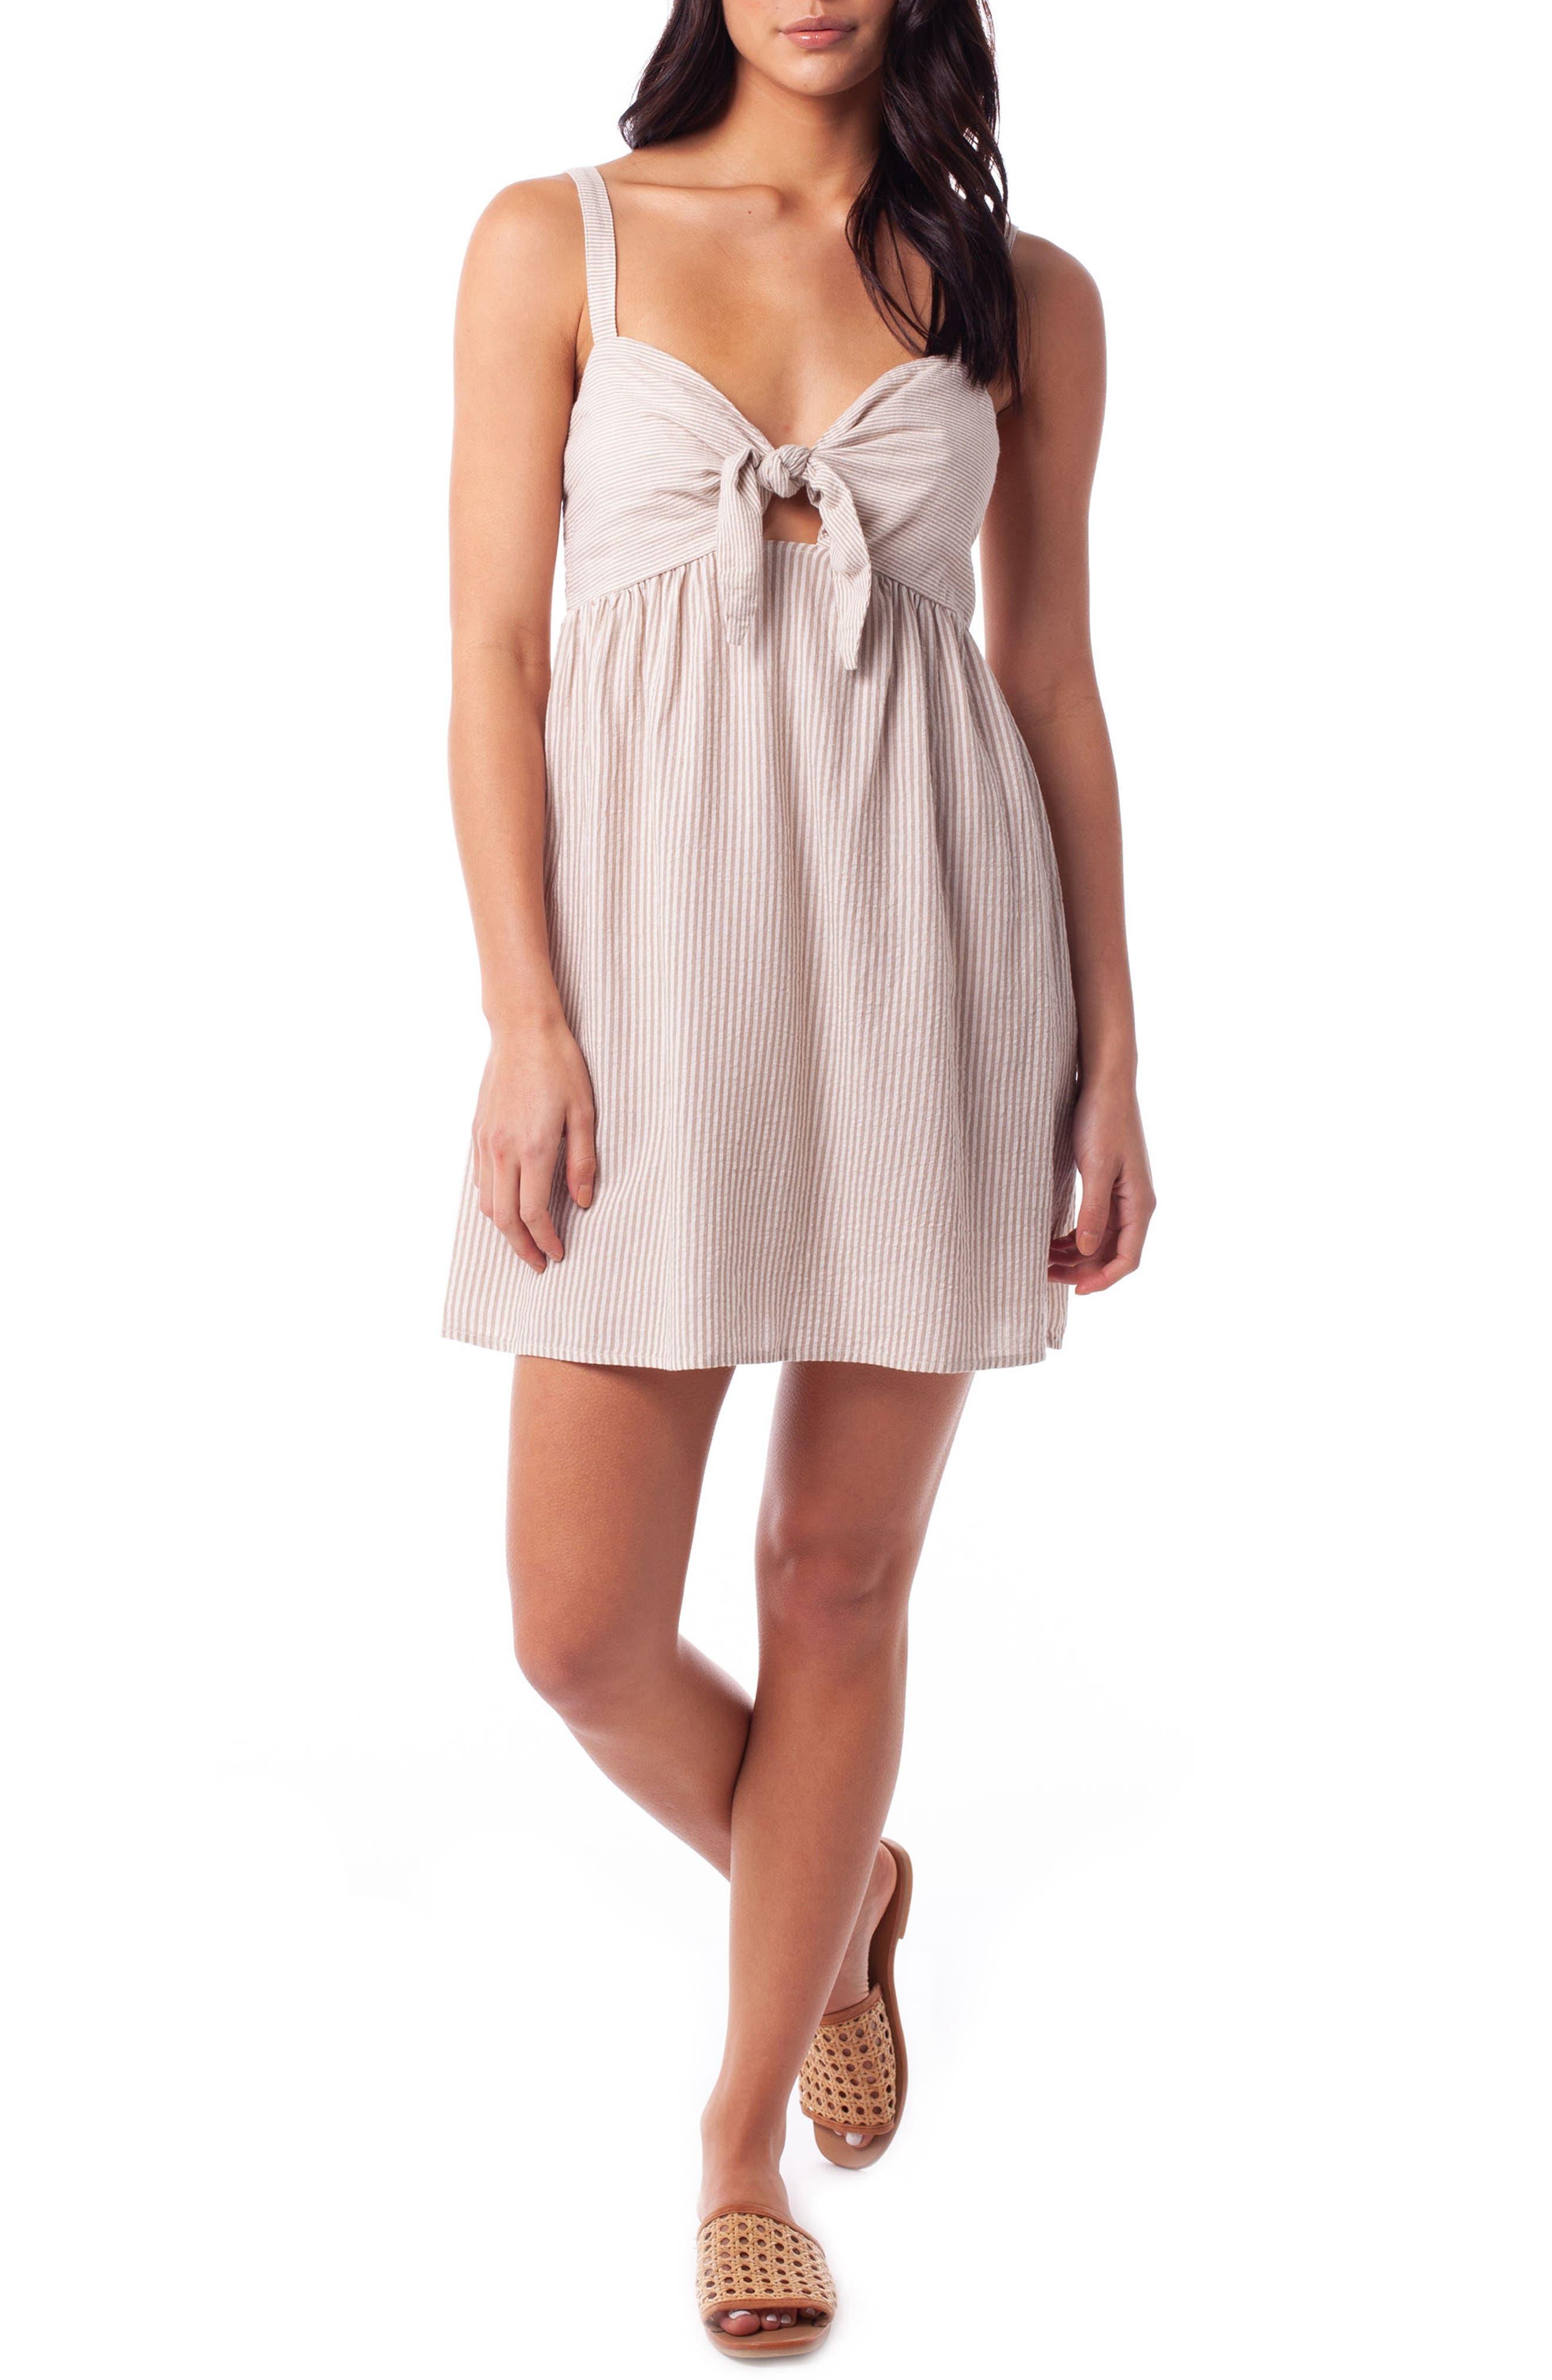 Rhythm Cancun Seersucker Cover-Up Dress, Beige